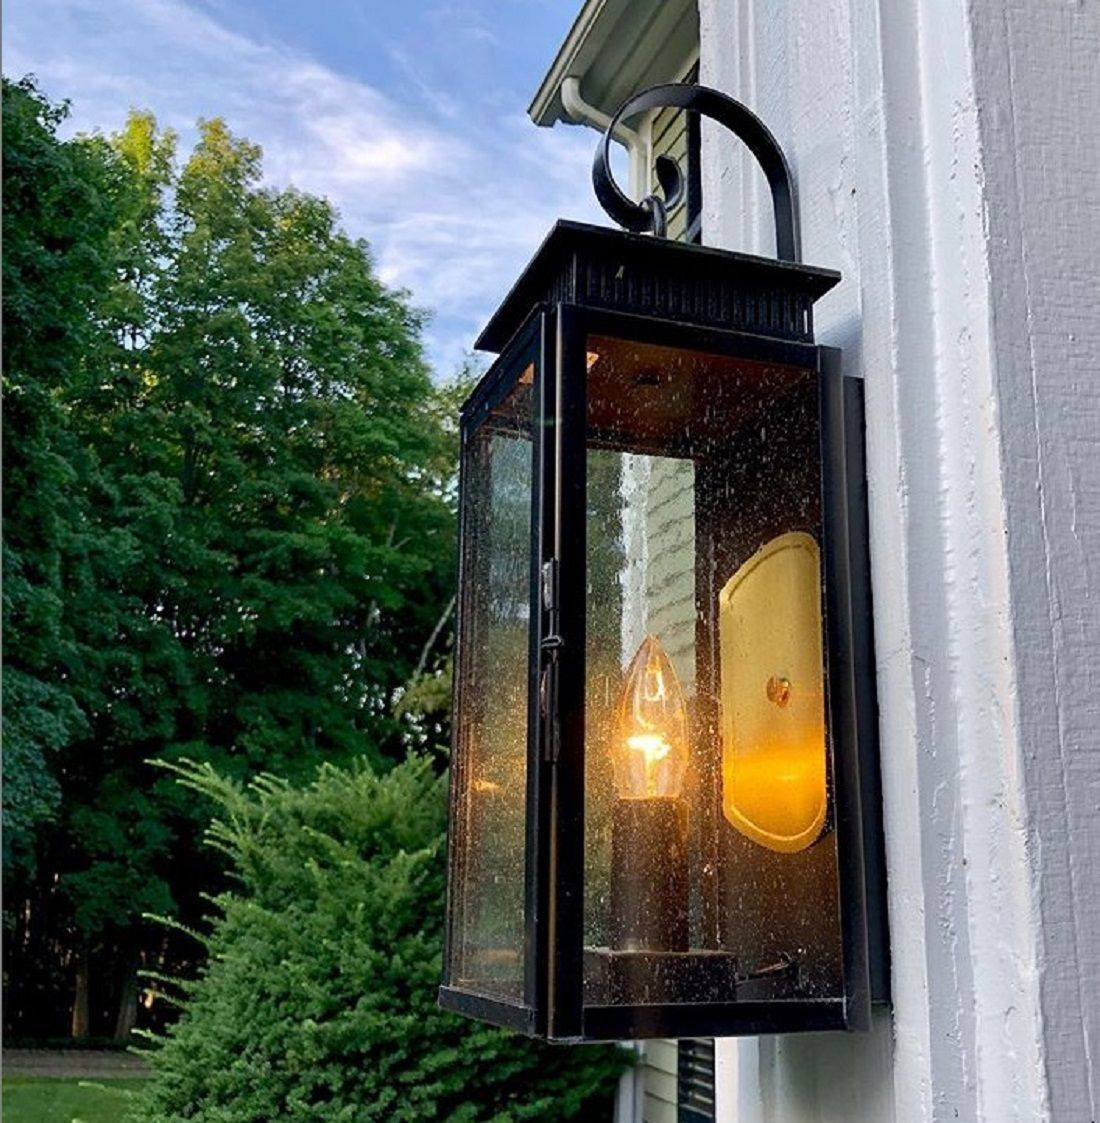 1800 Series 1 Light Outdoor Wall Lantern In 2020 Outdoor Wall Lantern Wall Lantern Porch Lighting